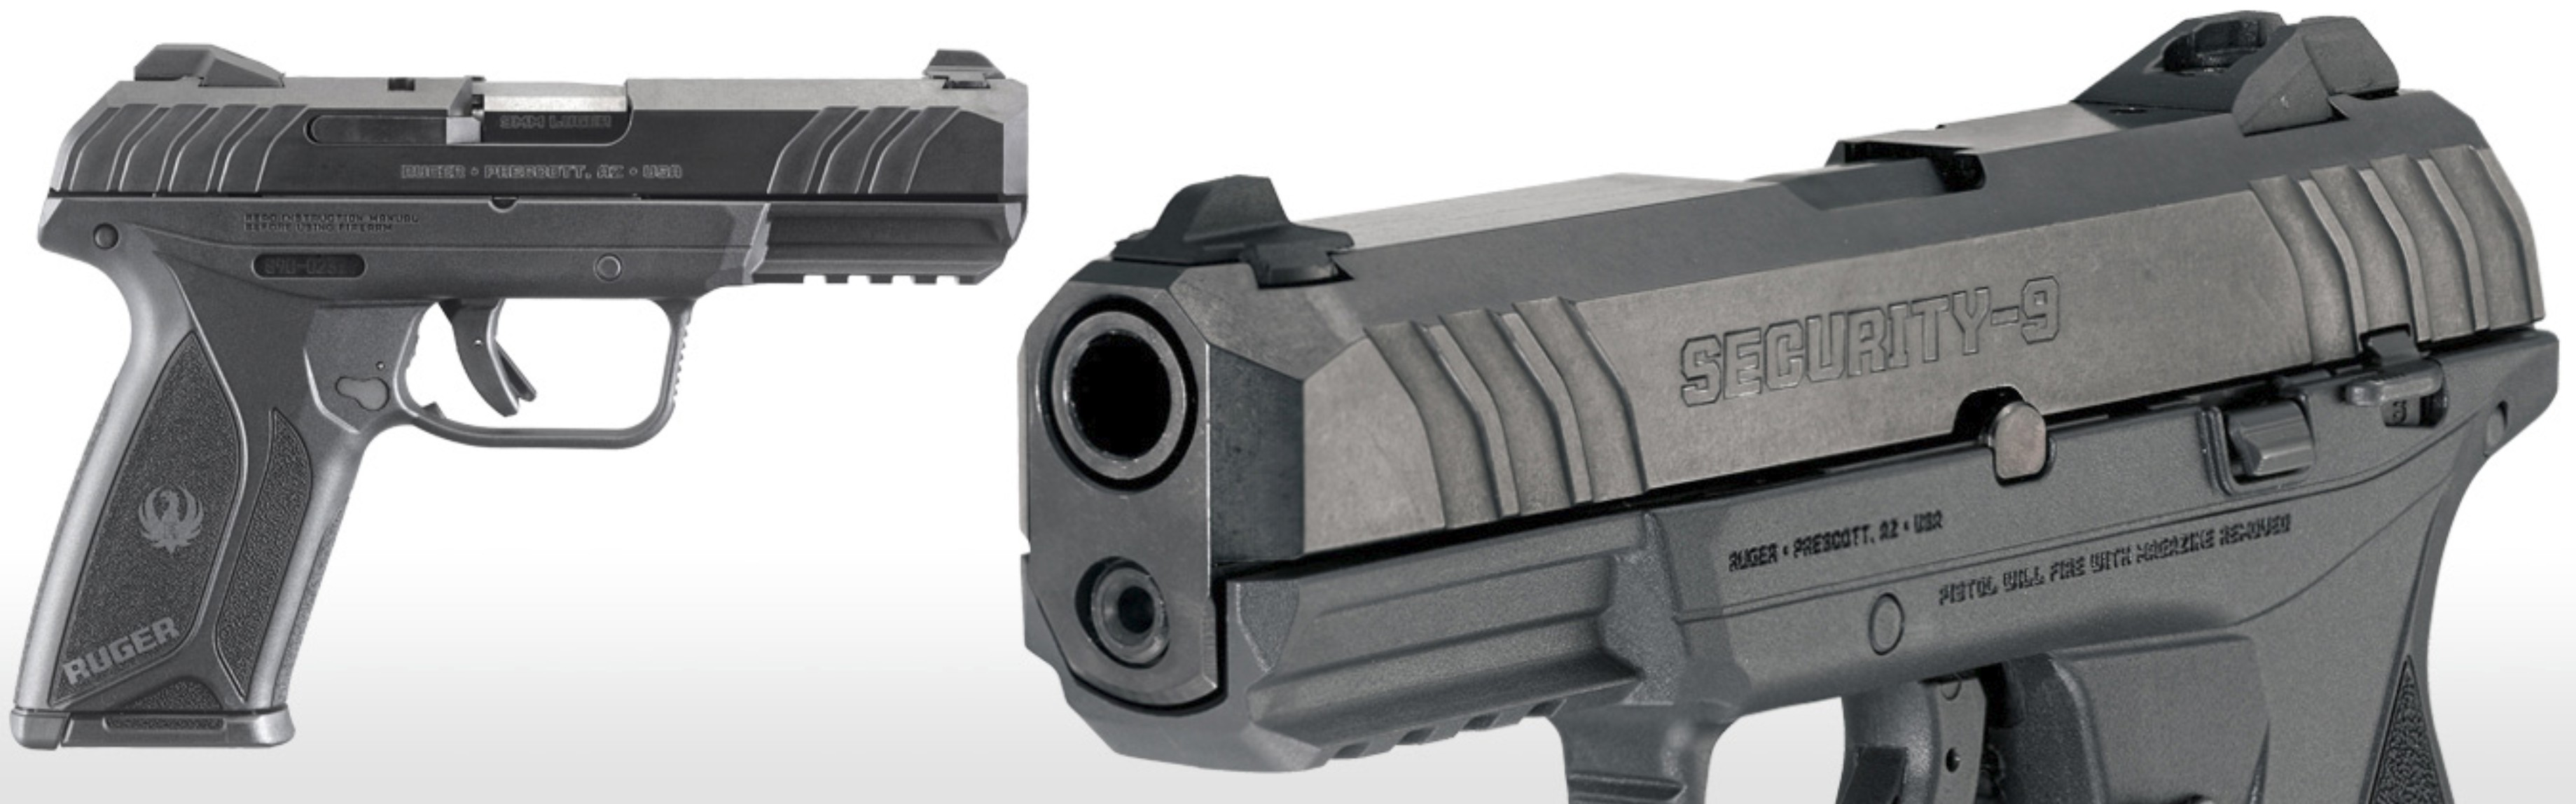 Ruger Announces New Pistol